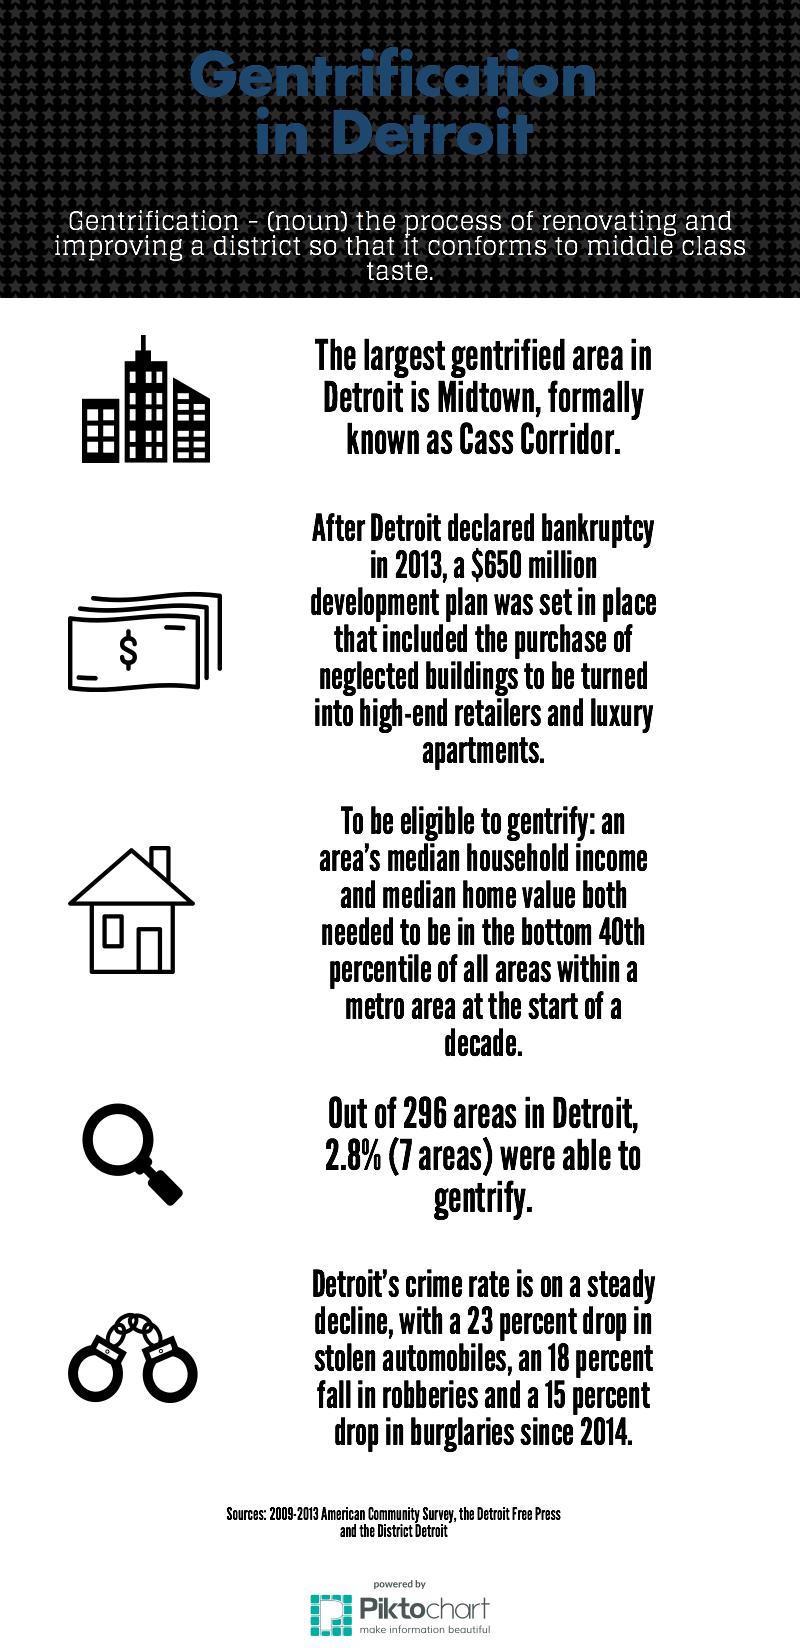 Infographic by Bianca Pugliesi '19